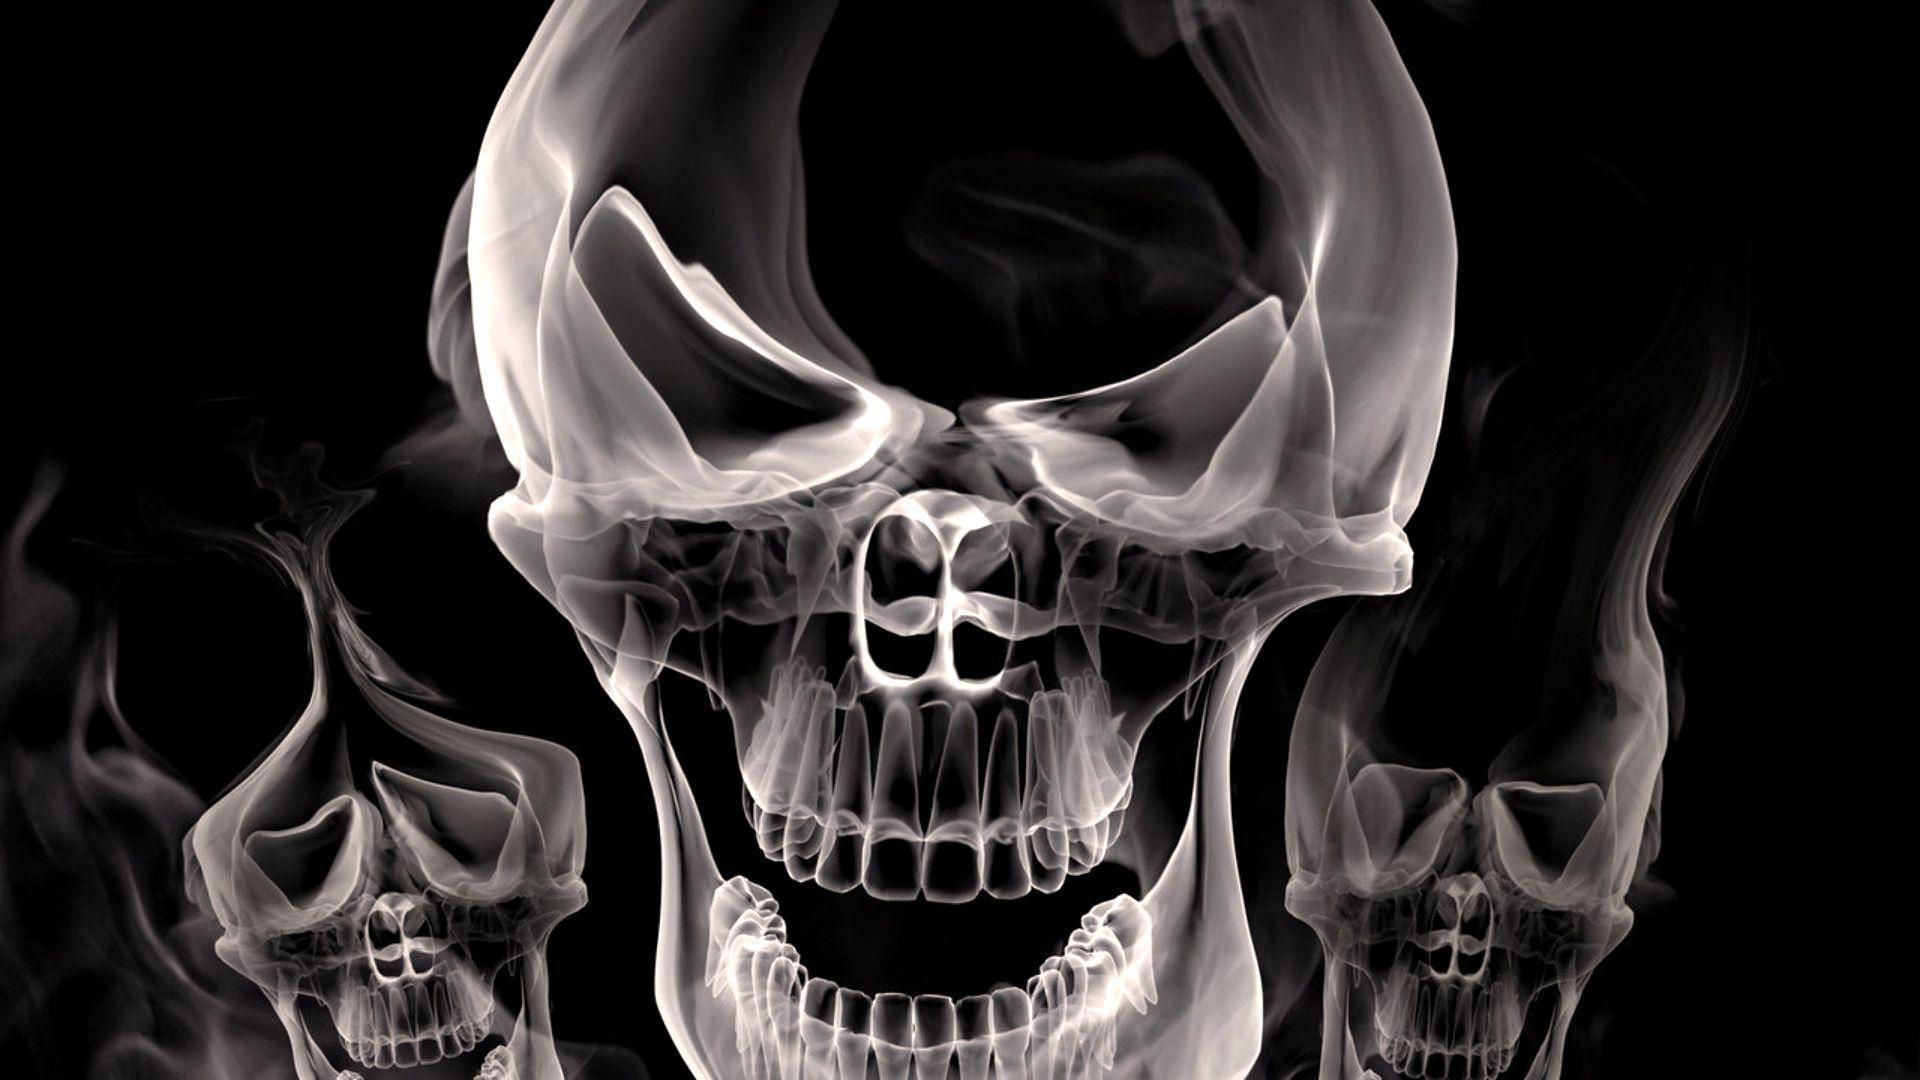 3d Skull Smoke Wallpaper | HD Wallpapers | Desktop Wallpapers